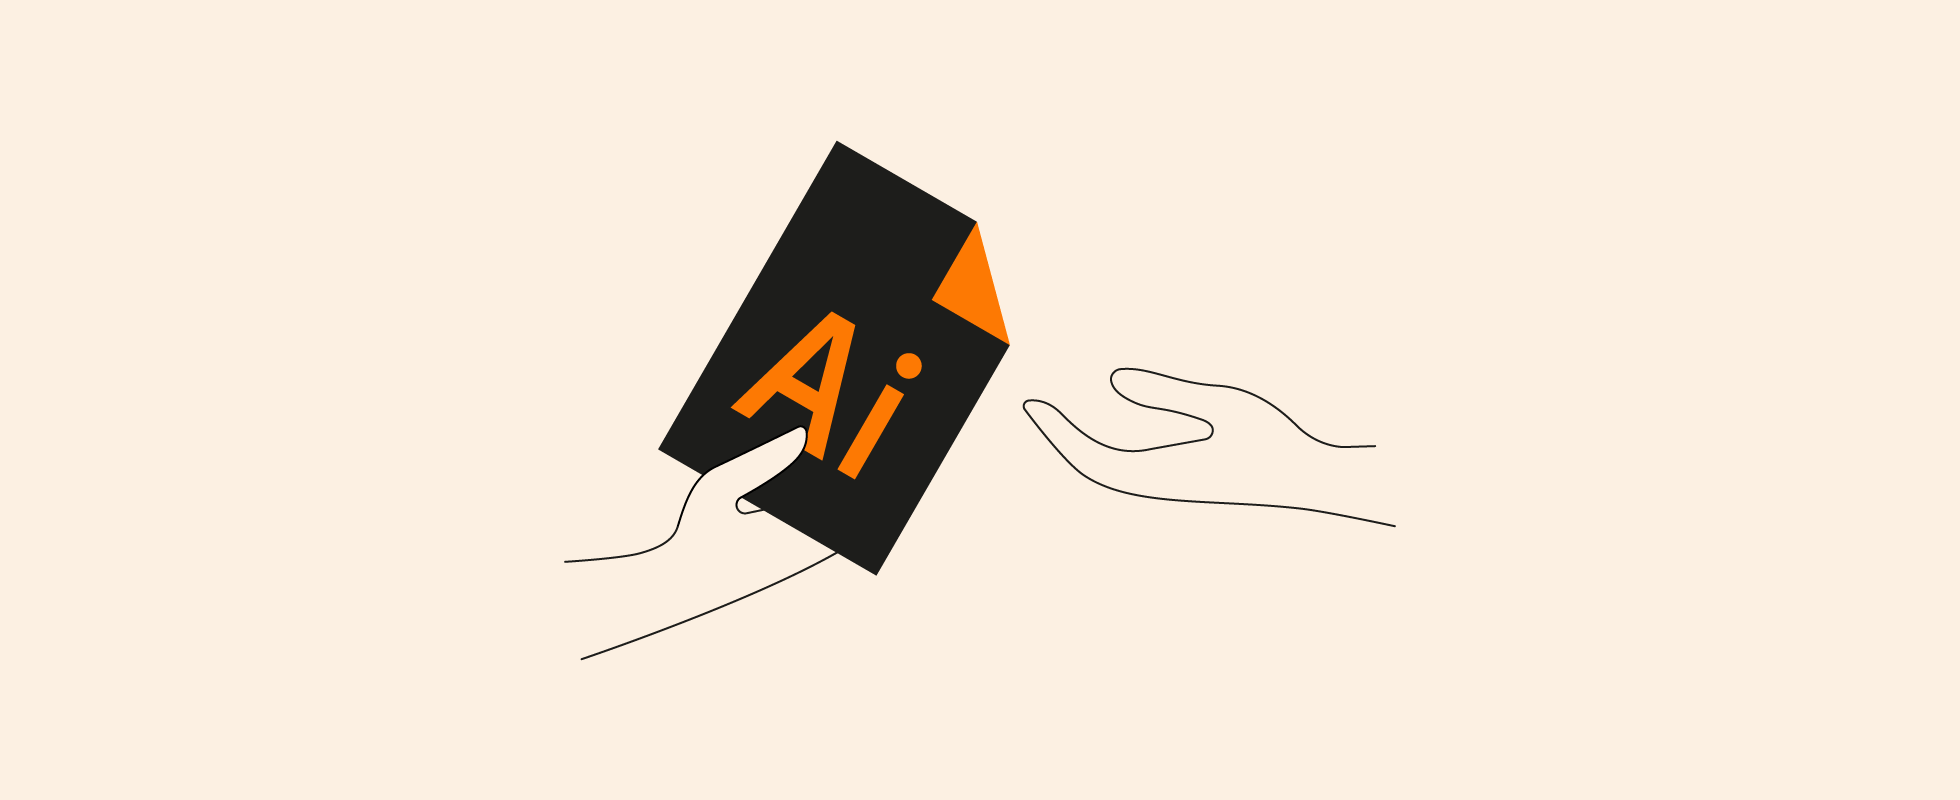 How to prepare design file for Lottie animation